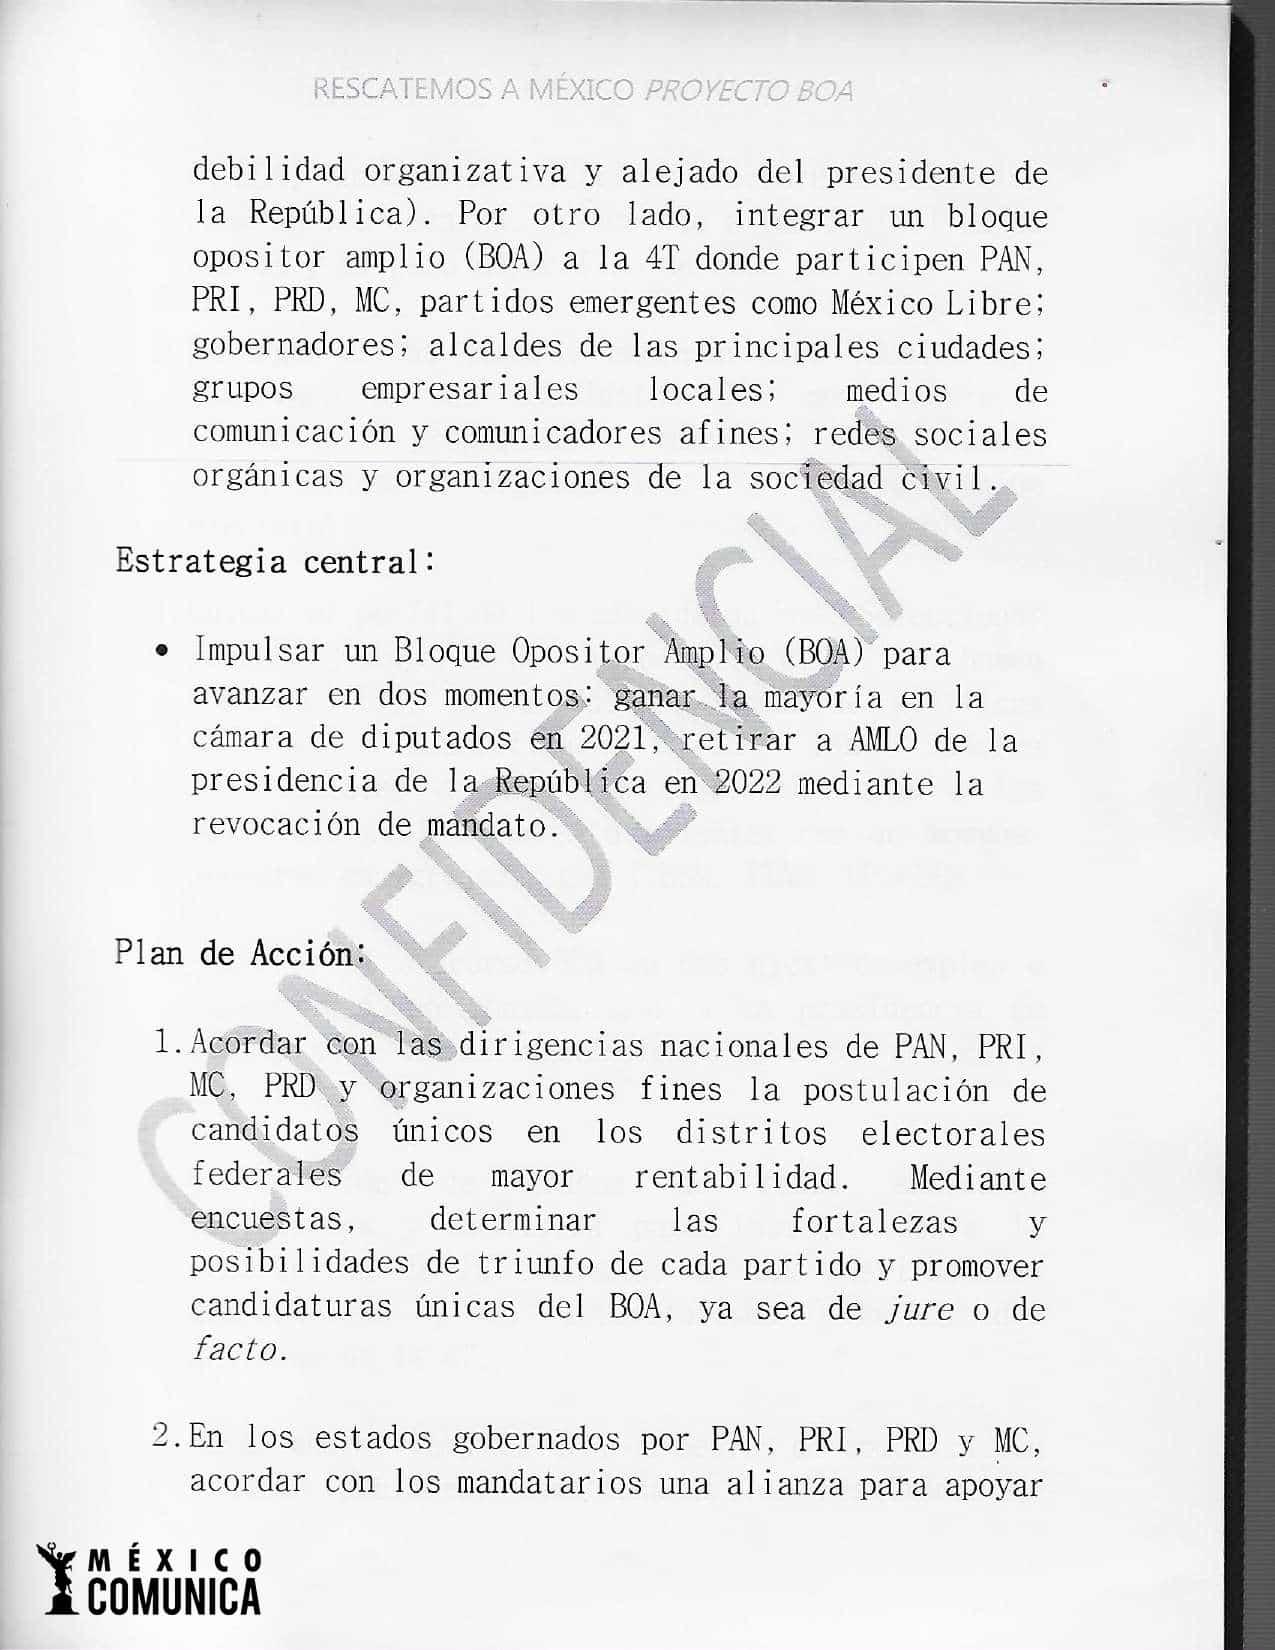 DocumentoRescatemosaMexico3